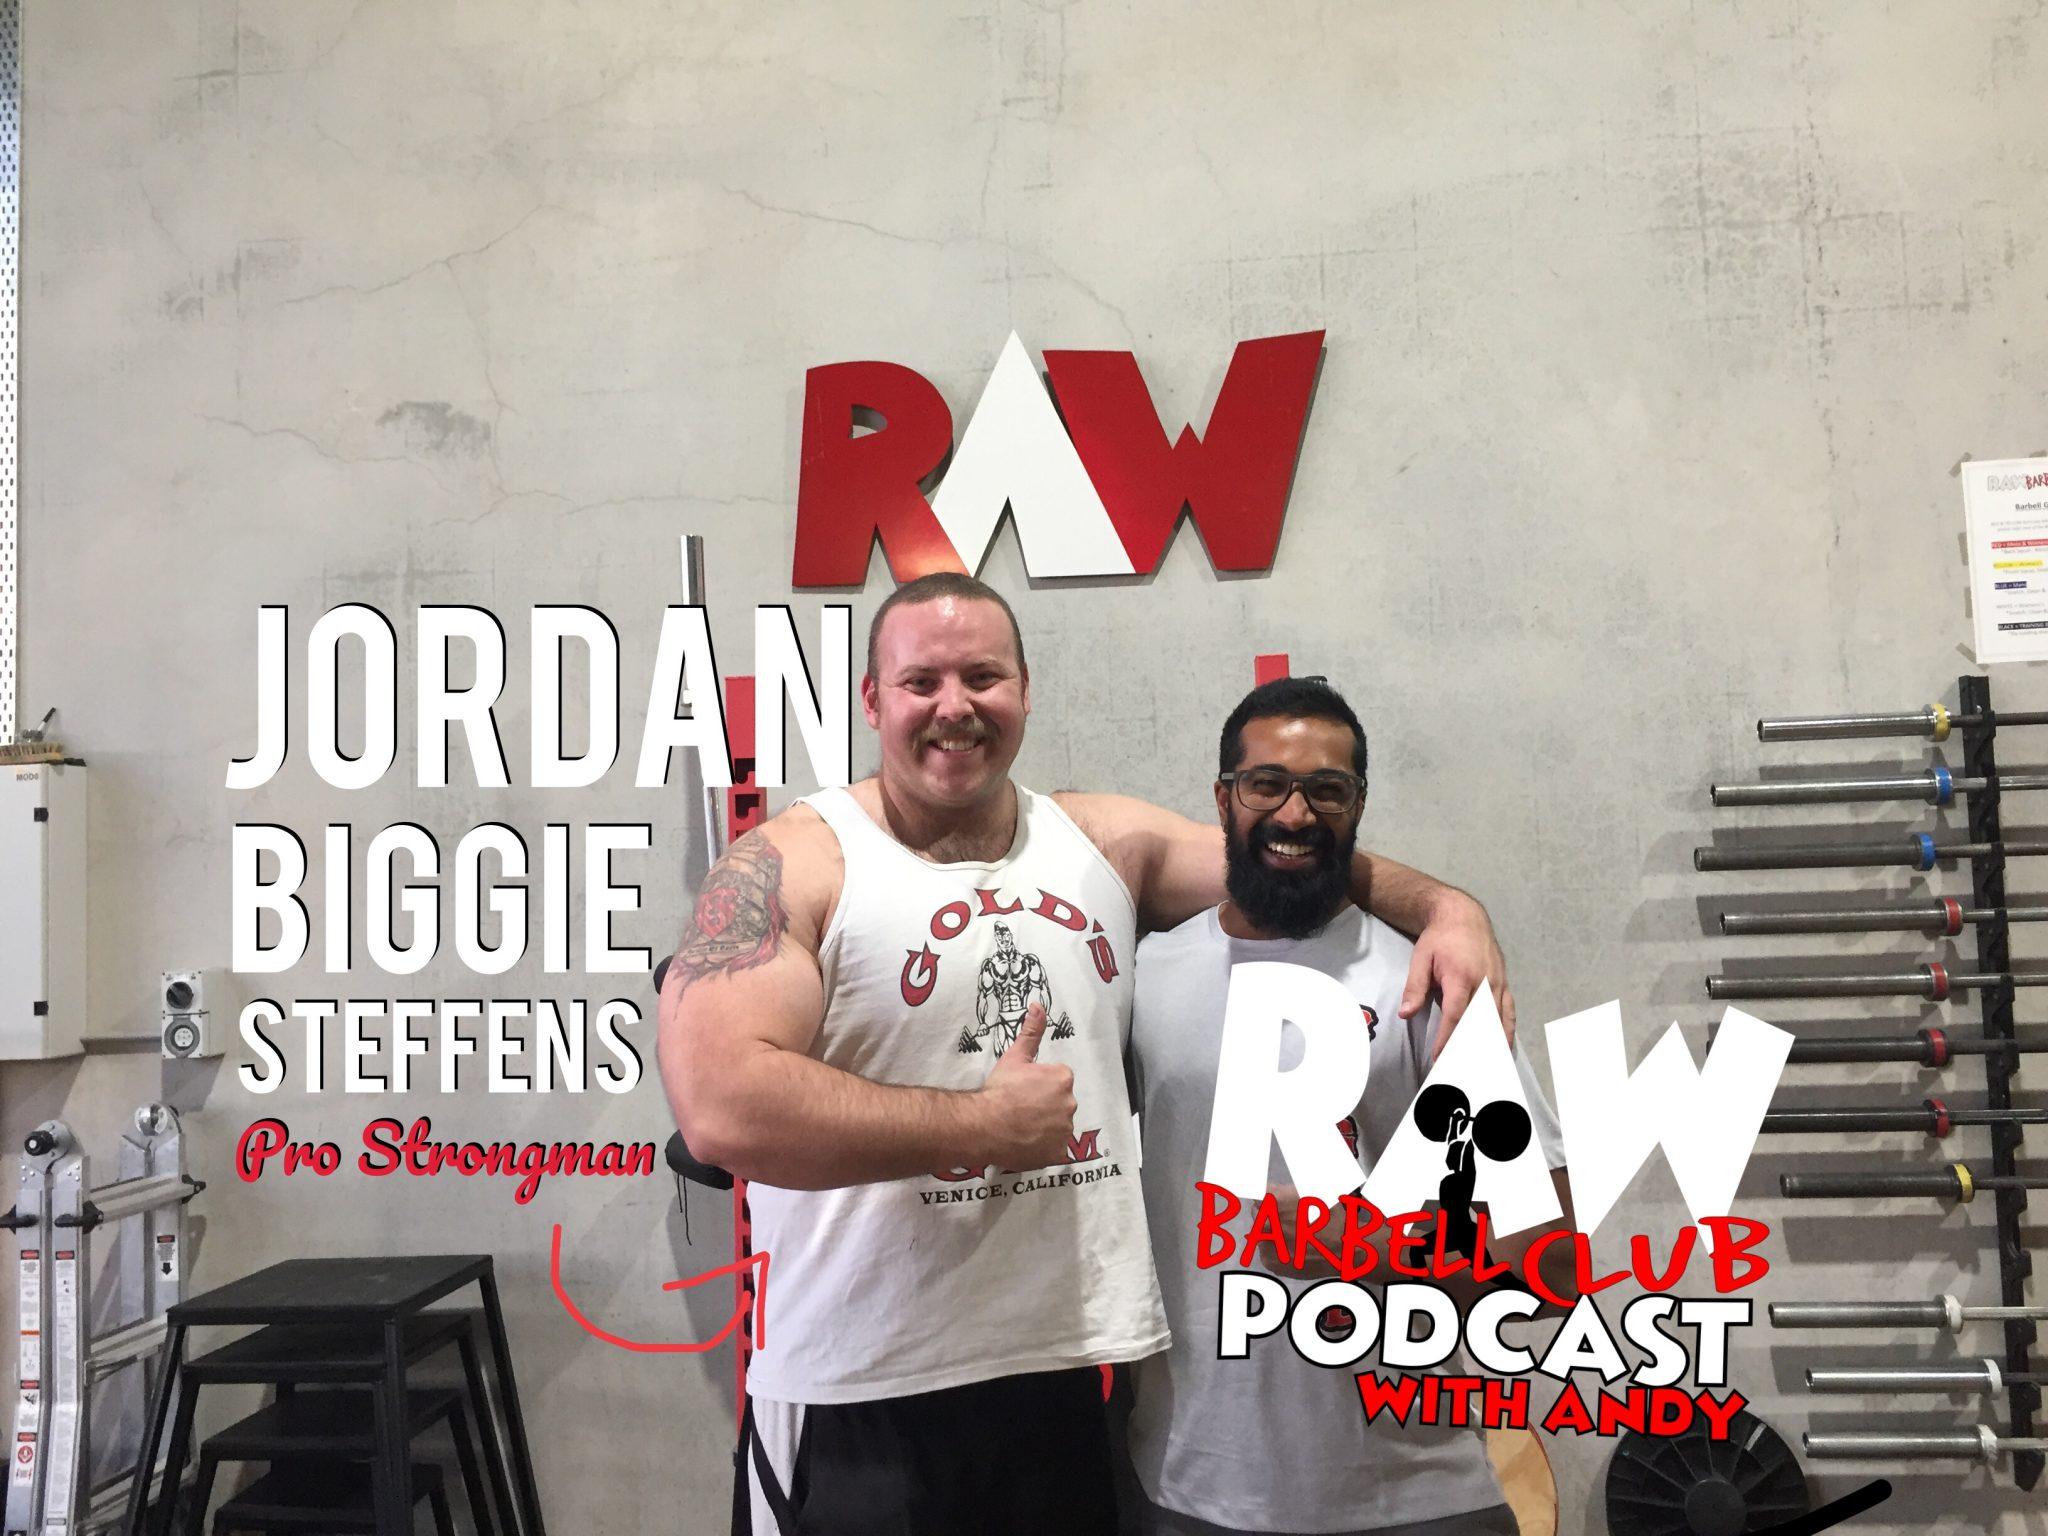 Jordan 'Biggie' Steffens : King of The Circus, Strongman & Weightlifting